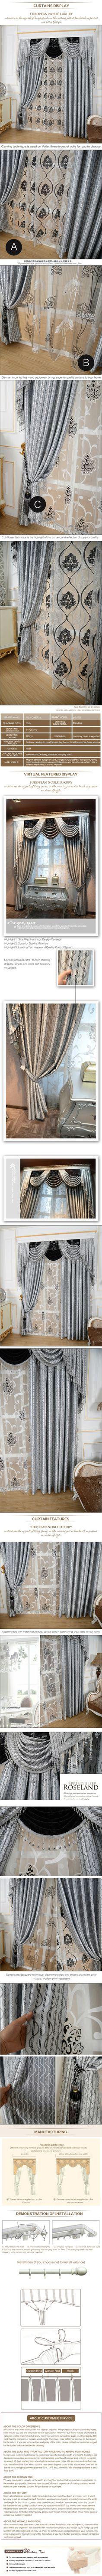 luxury window curtain - Silver Queen $132  (55% off)